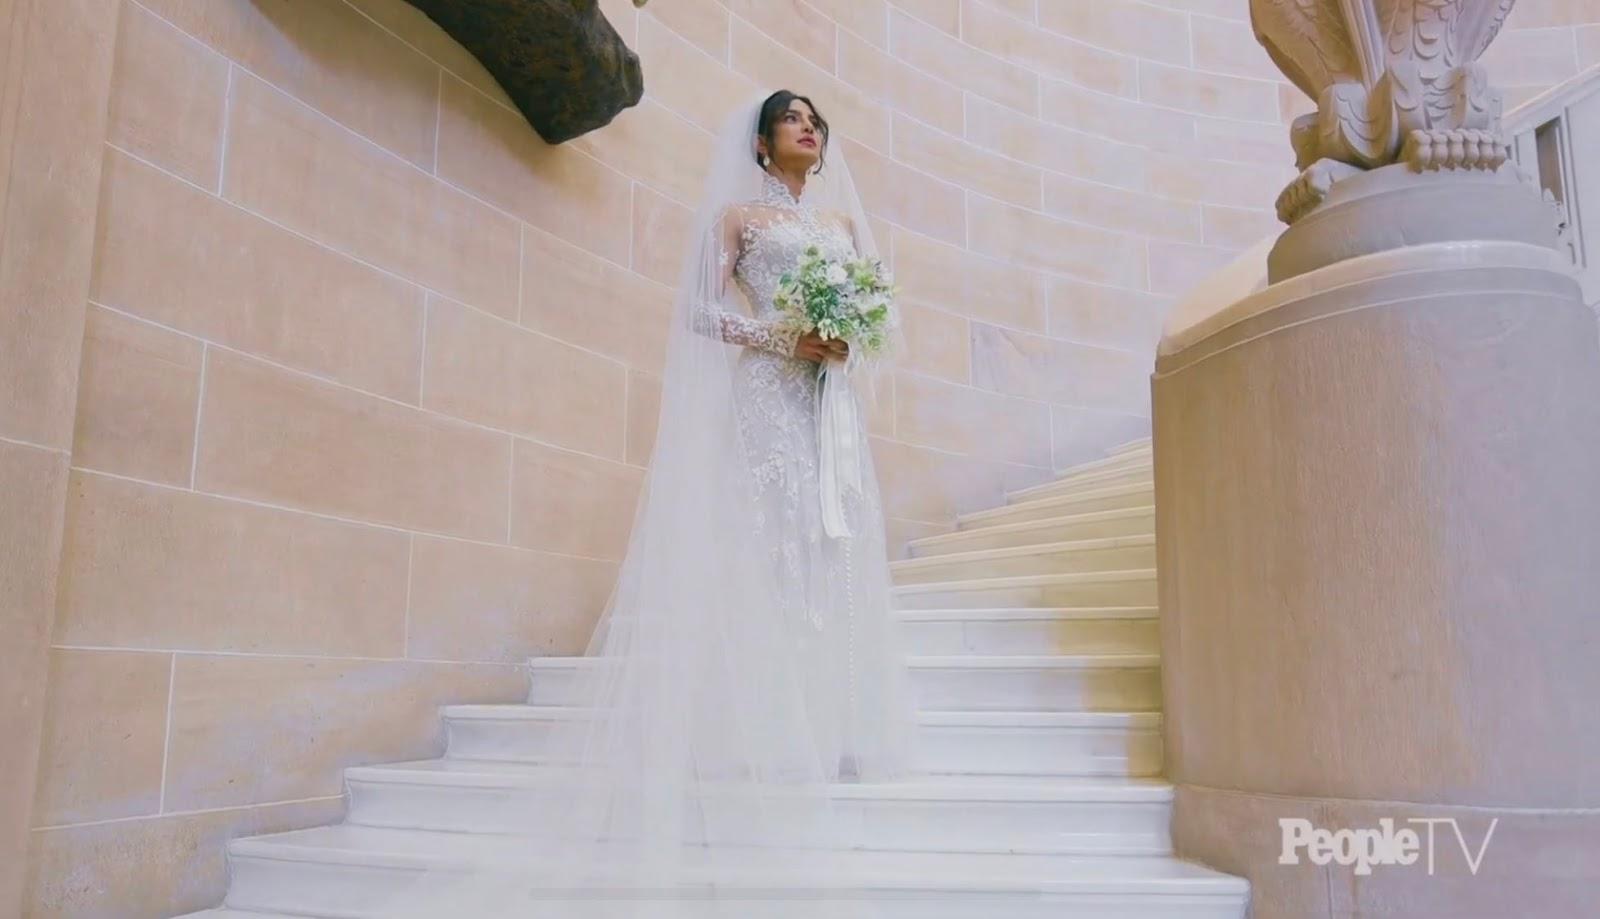 Priyanka Chopra's Wedding Dress: Stuns In Sheer Ralph Lauren Gown To Marry Nick Jonas